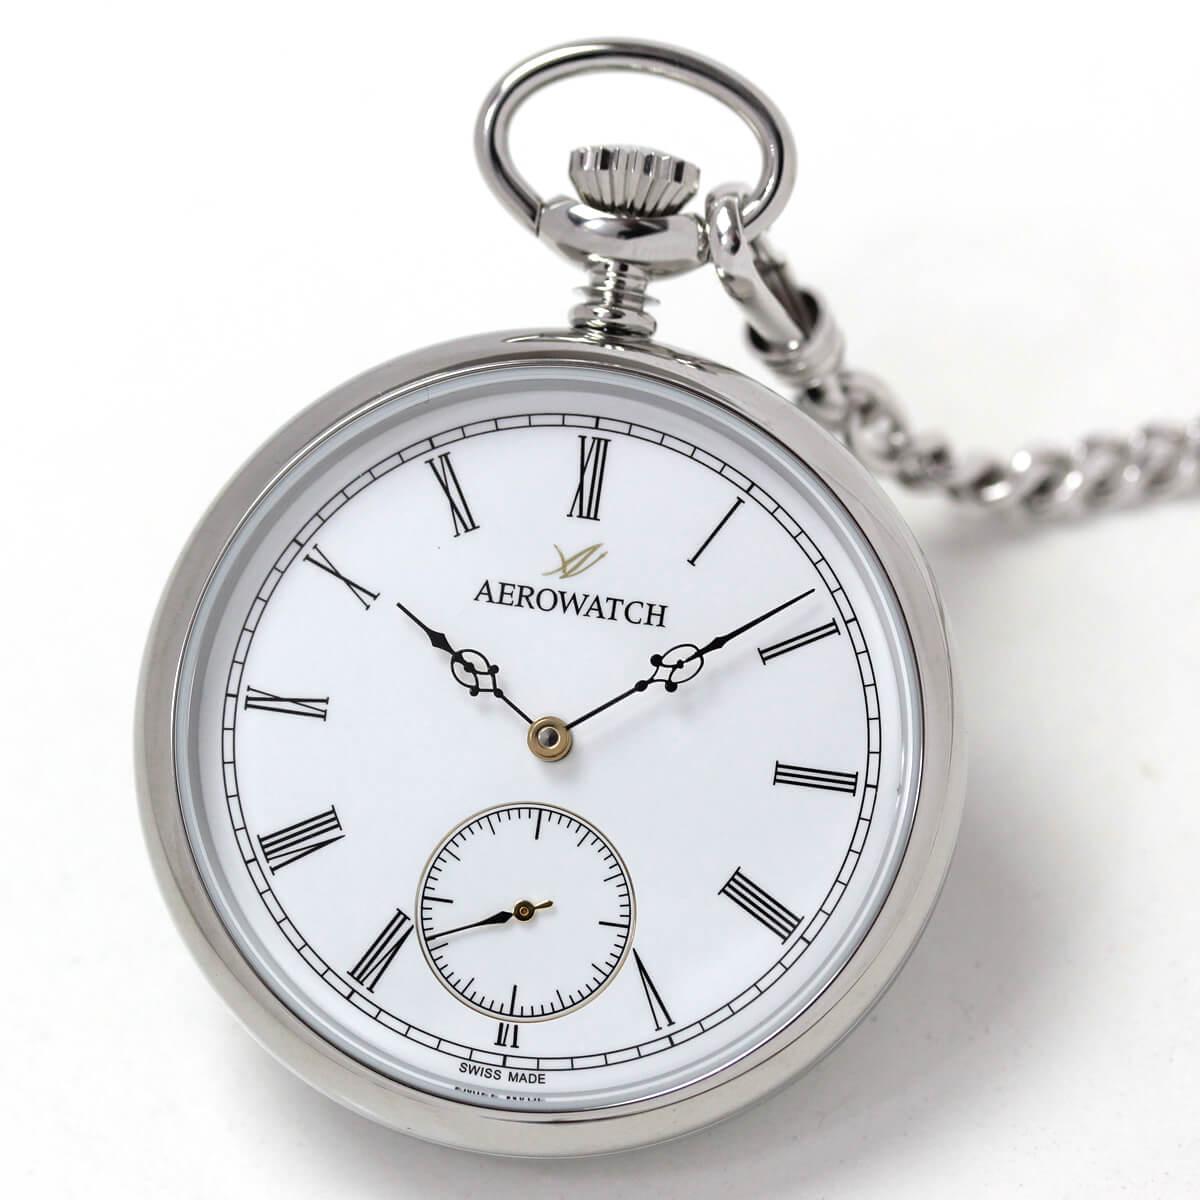 AERO(アエロ) 手巻き式 50616AA03 懐中時計